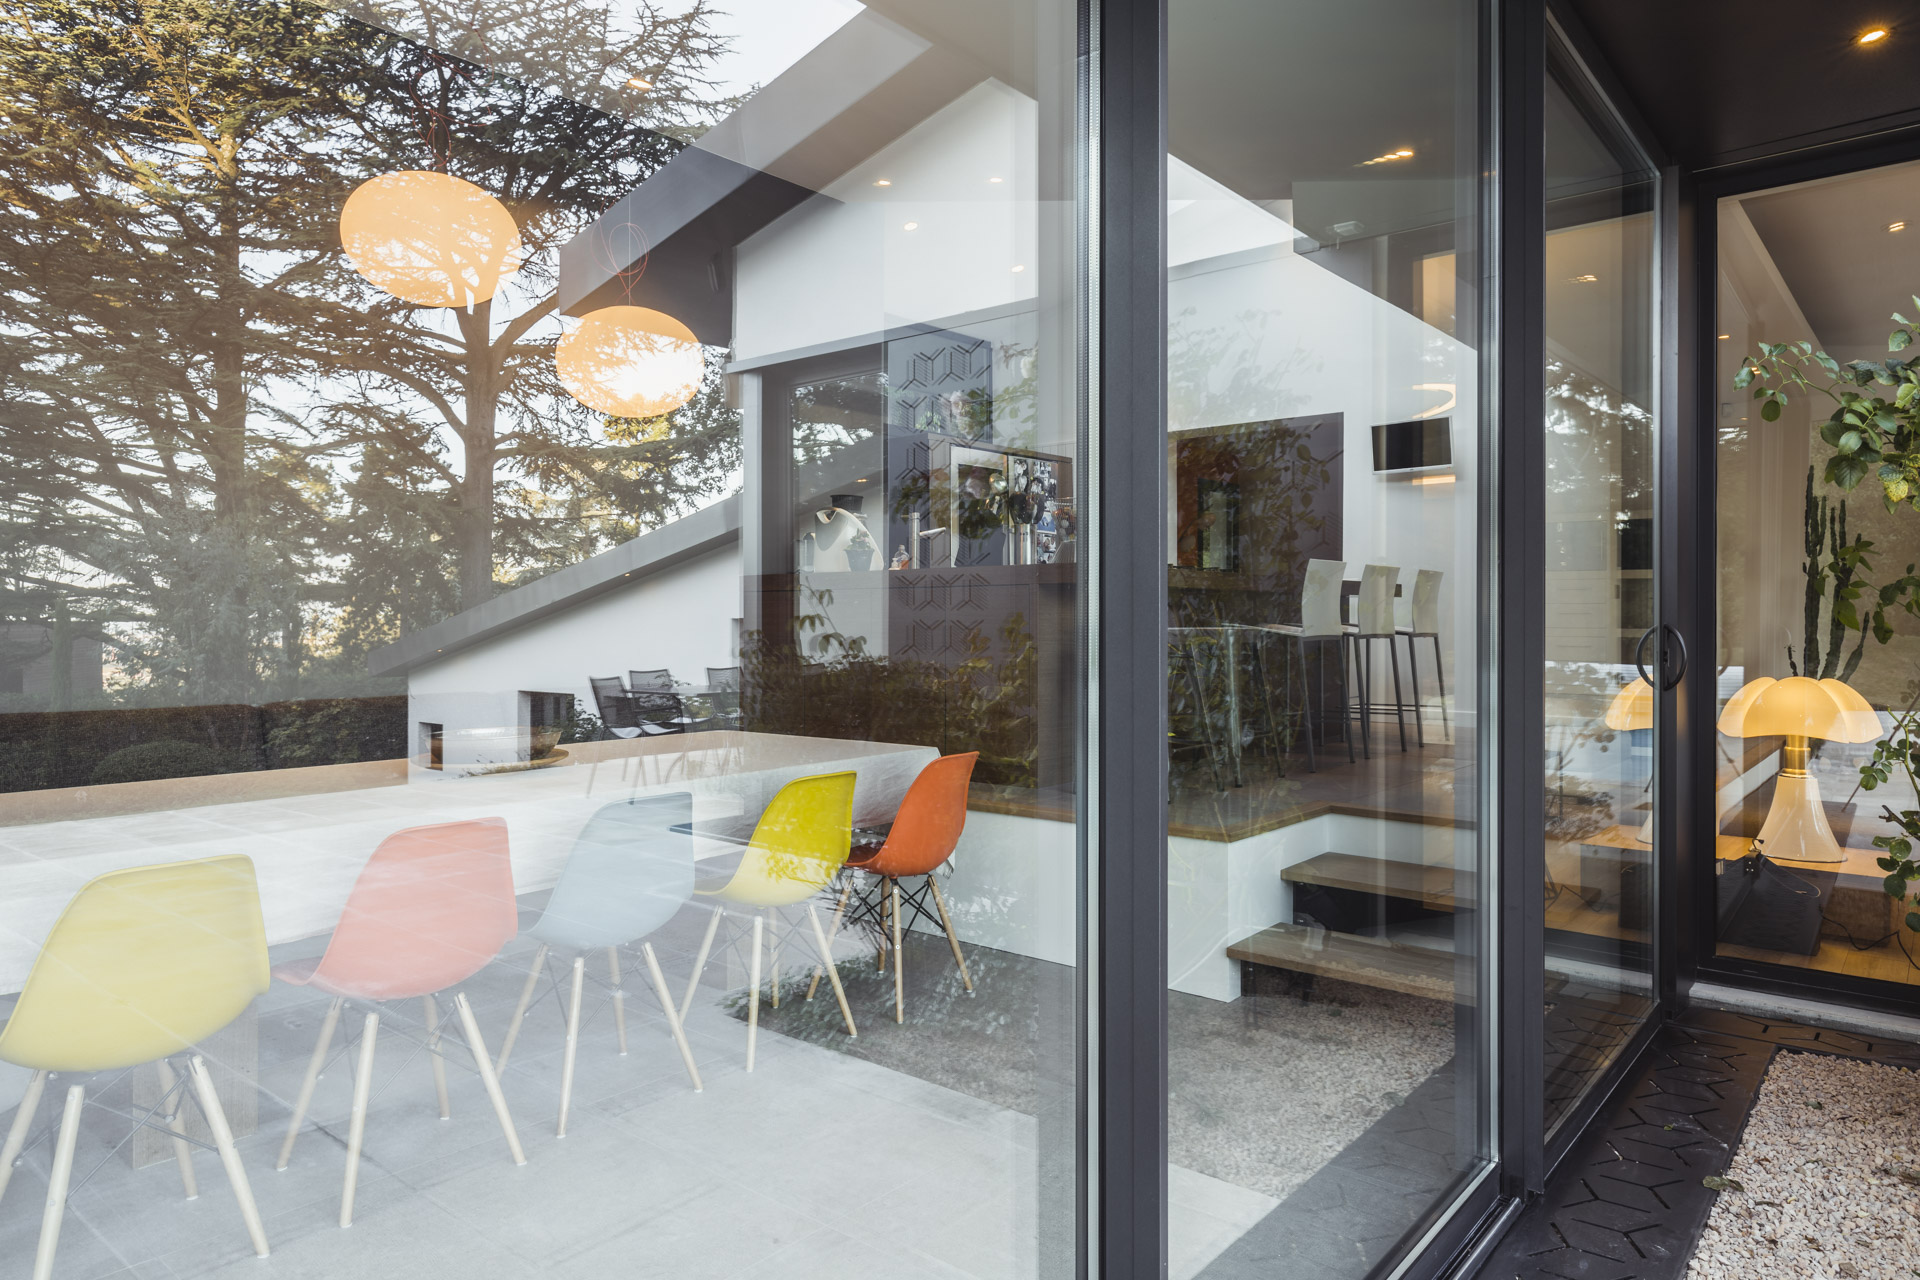 baie vitrée moderne et design